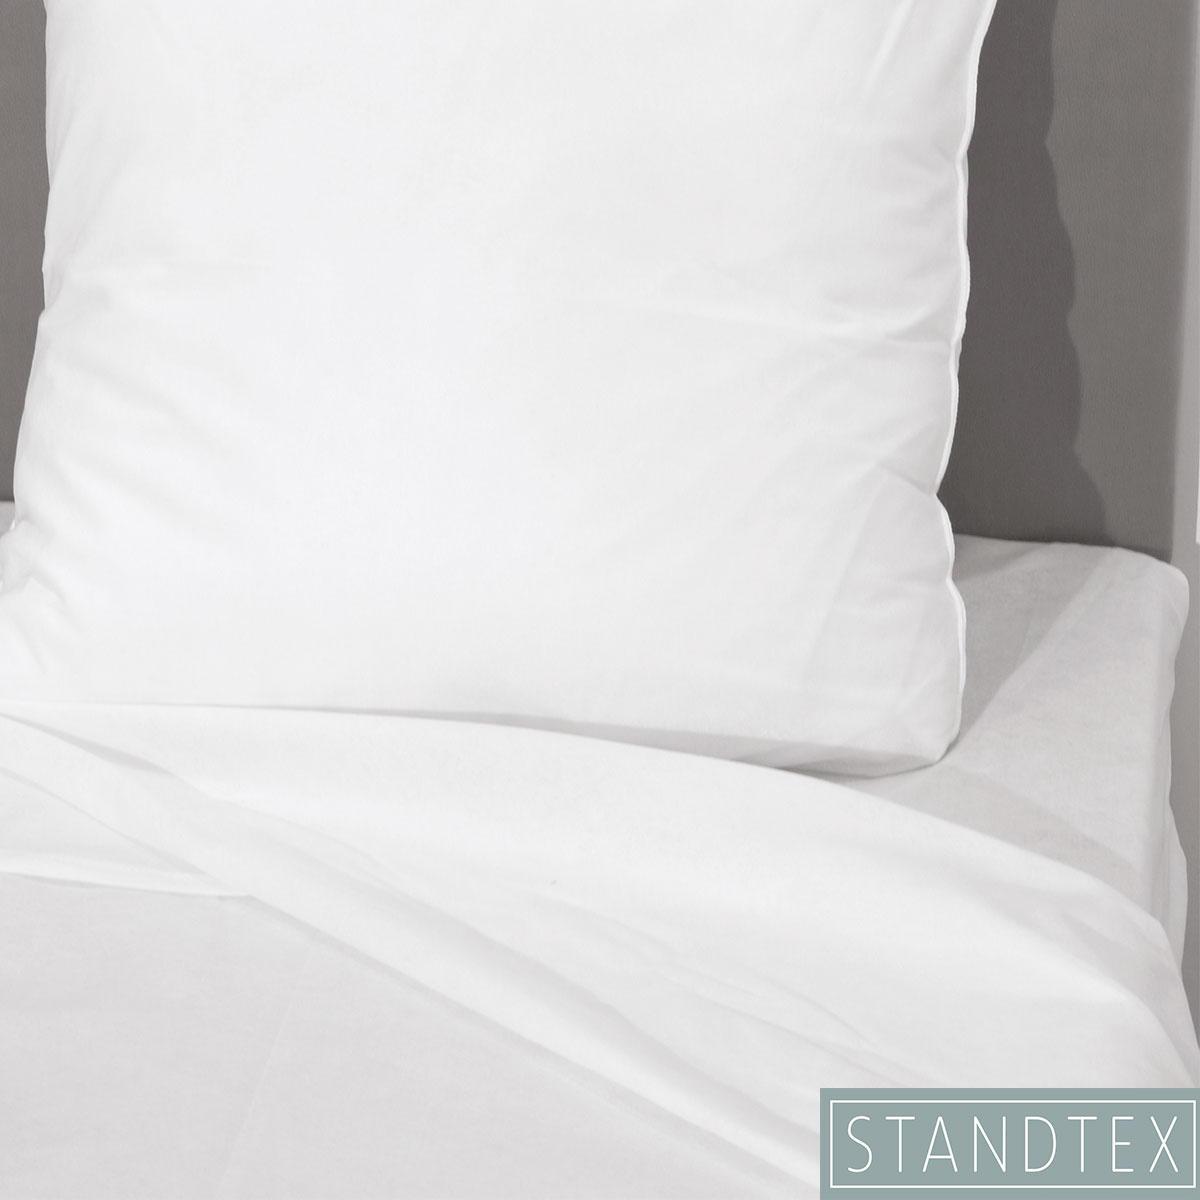 kit linge de lit semi durable performance standard textile. Black Bedroom Furniture Sets. Home Design Ideas